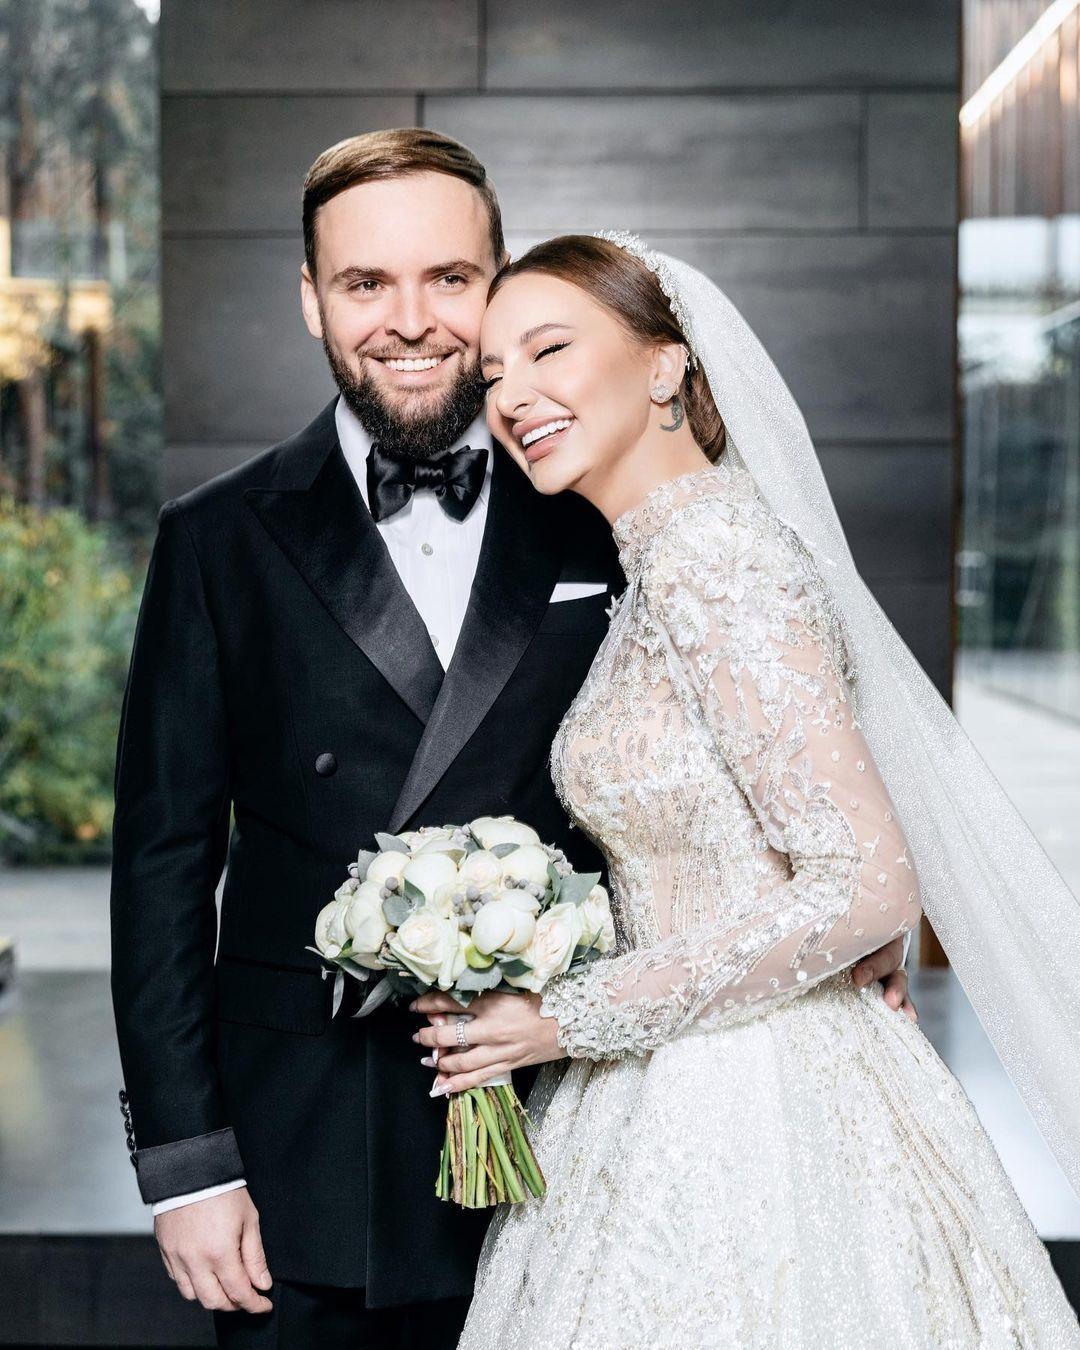 Asti та її чоловік Станіслав